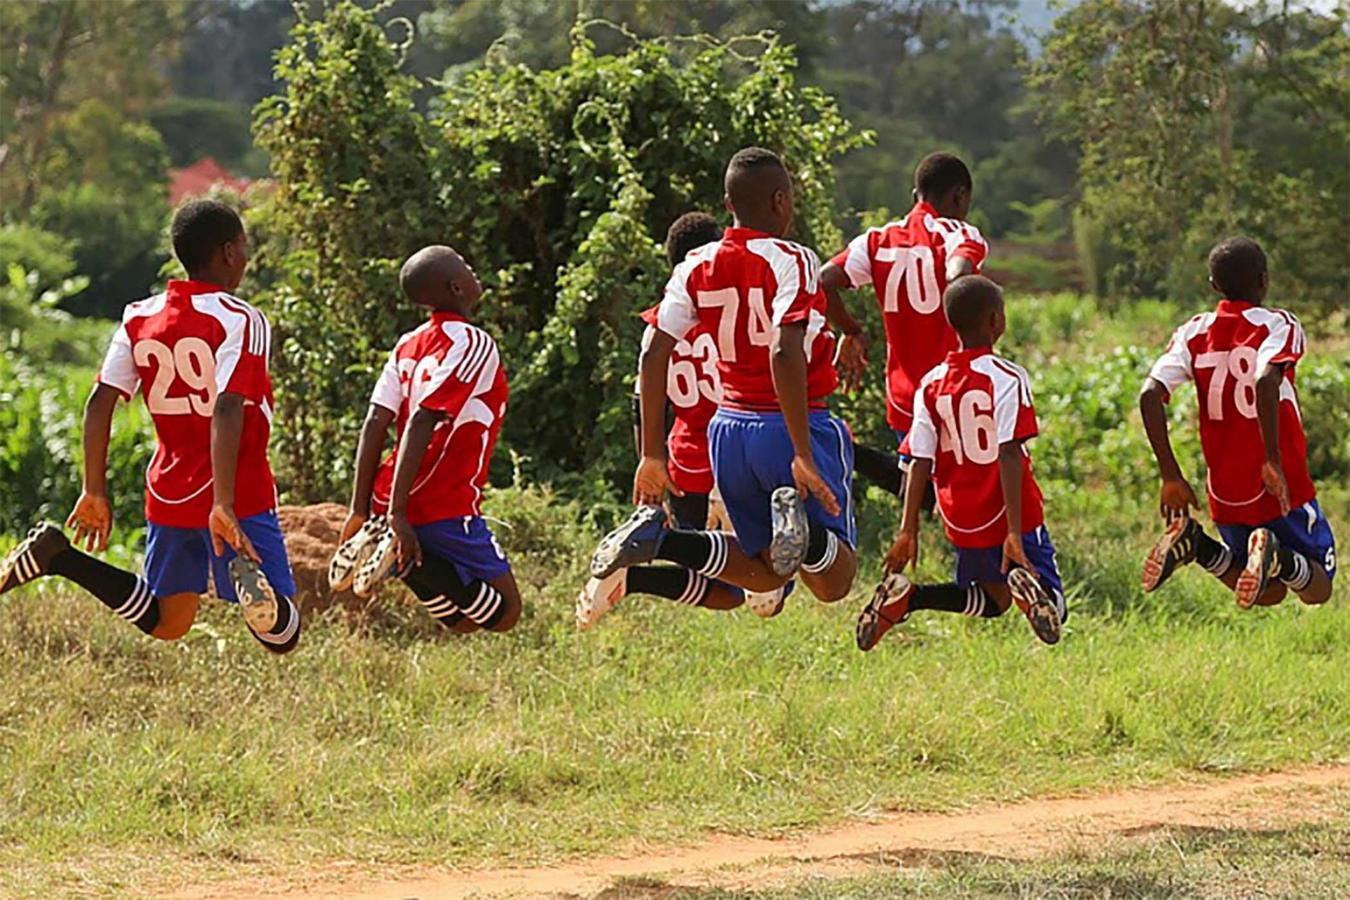 Play Proud: social change <br> through sport